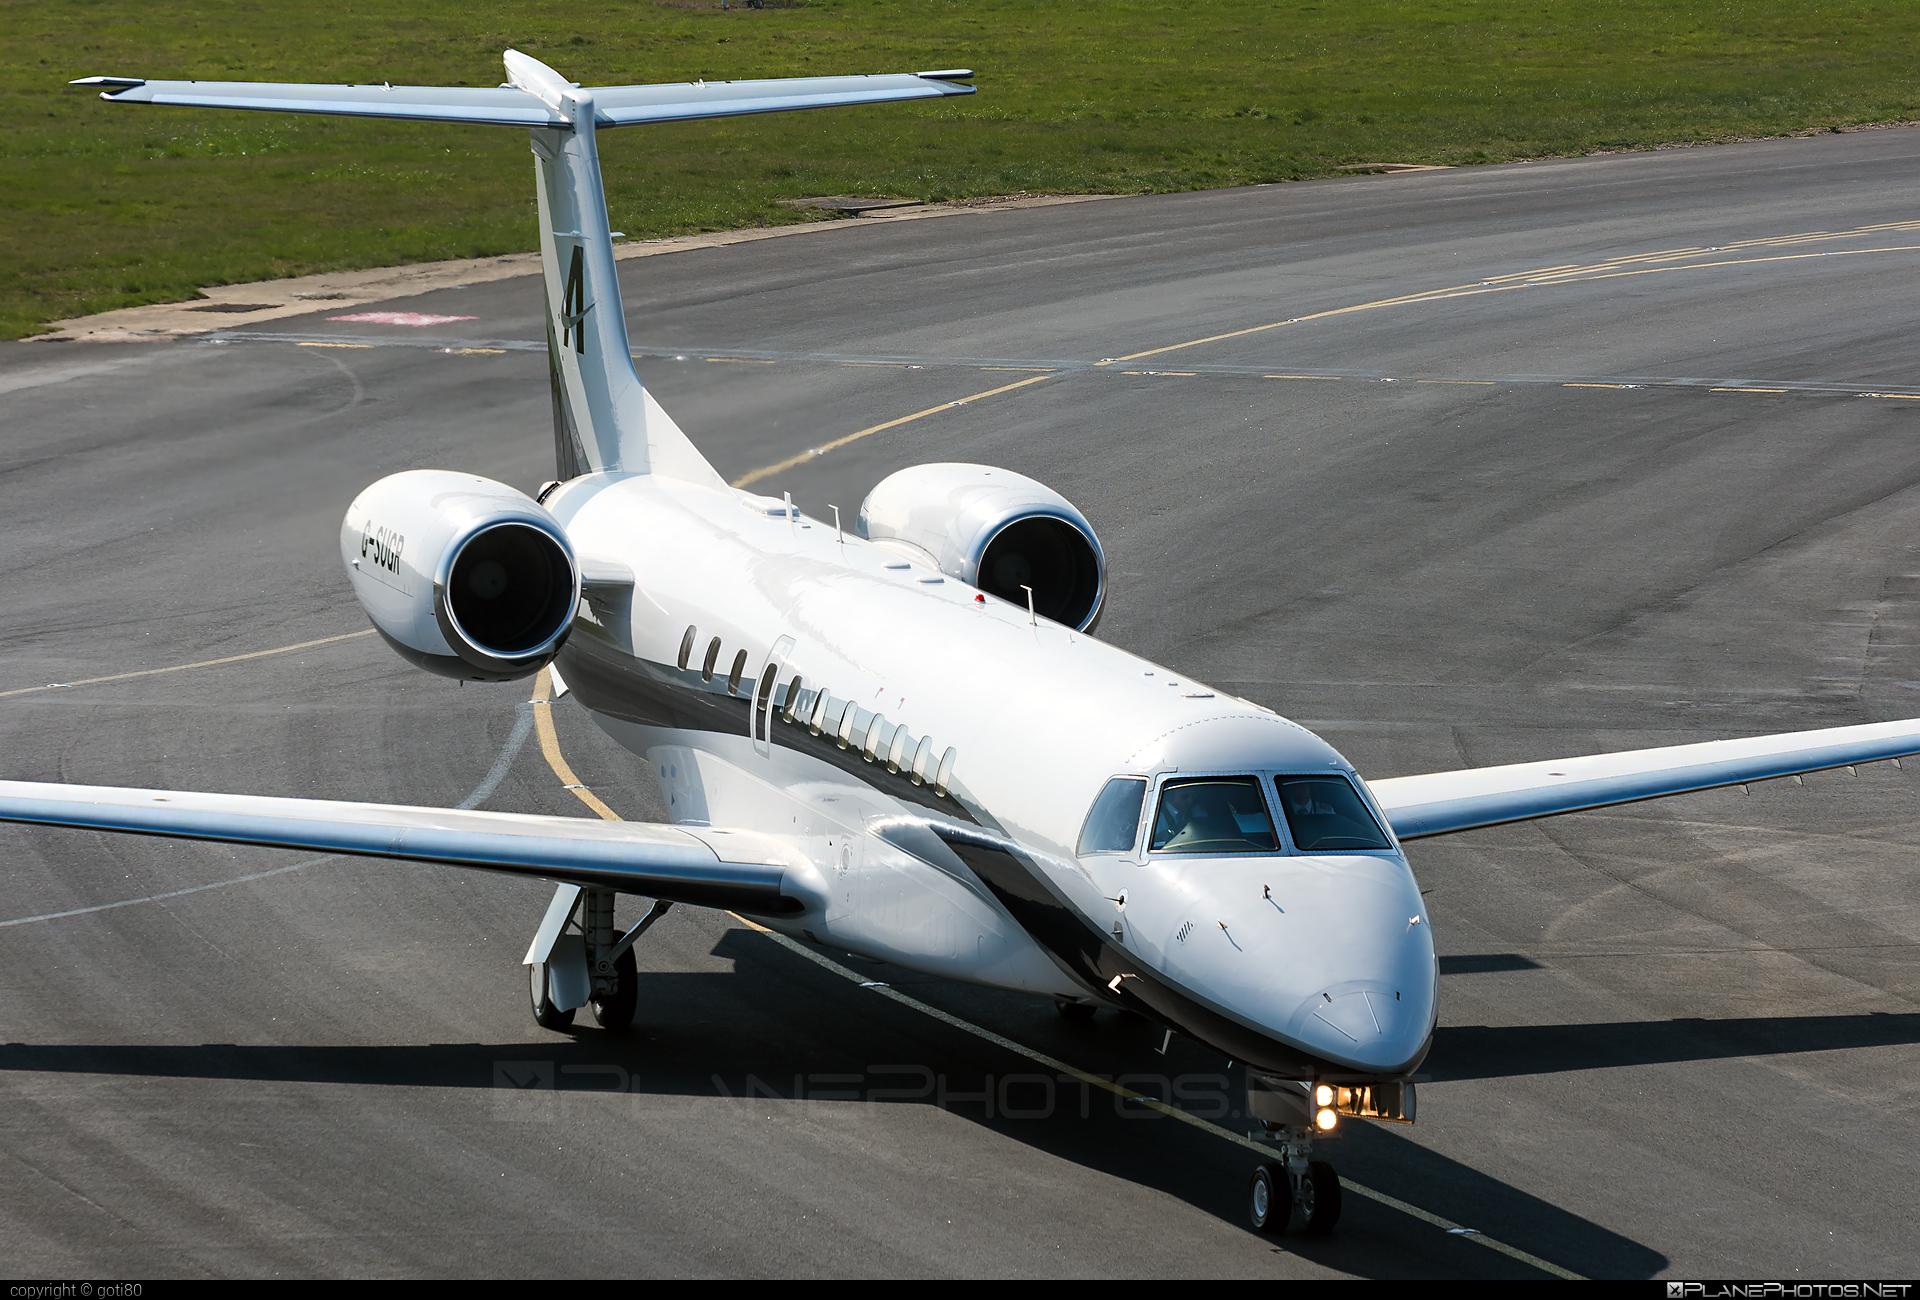 Embraer Legacy 650 (ERJ-135BJ) - G-SUGR operated by Air Charter Scotland #embraer #embraer135 #embraerlegacy #erj135 #erj135bj #legacy650